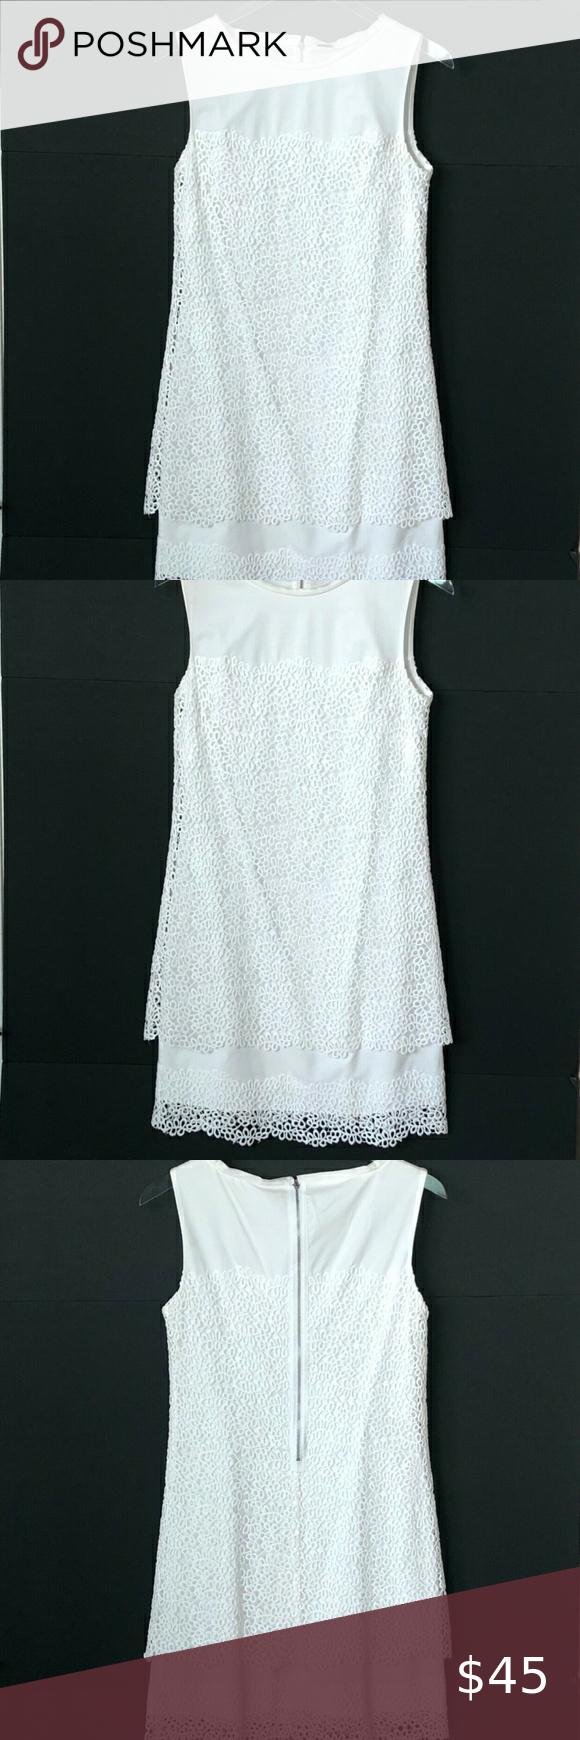 Elie Tahari White Cotton Lace Sleeveless Dress Elie Tahari Cotton Lace White Dress Summer [ 1740 x 580 Pixel ]